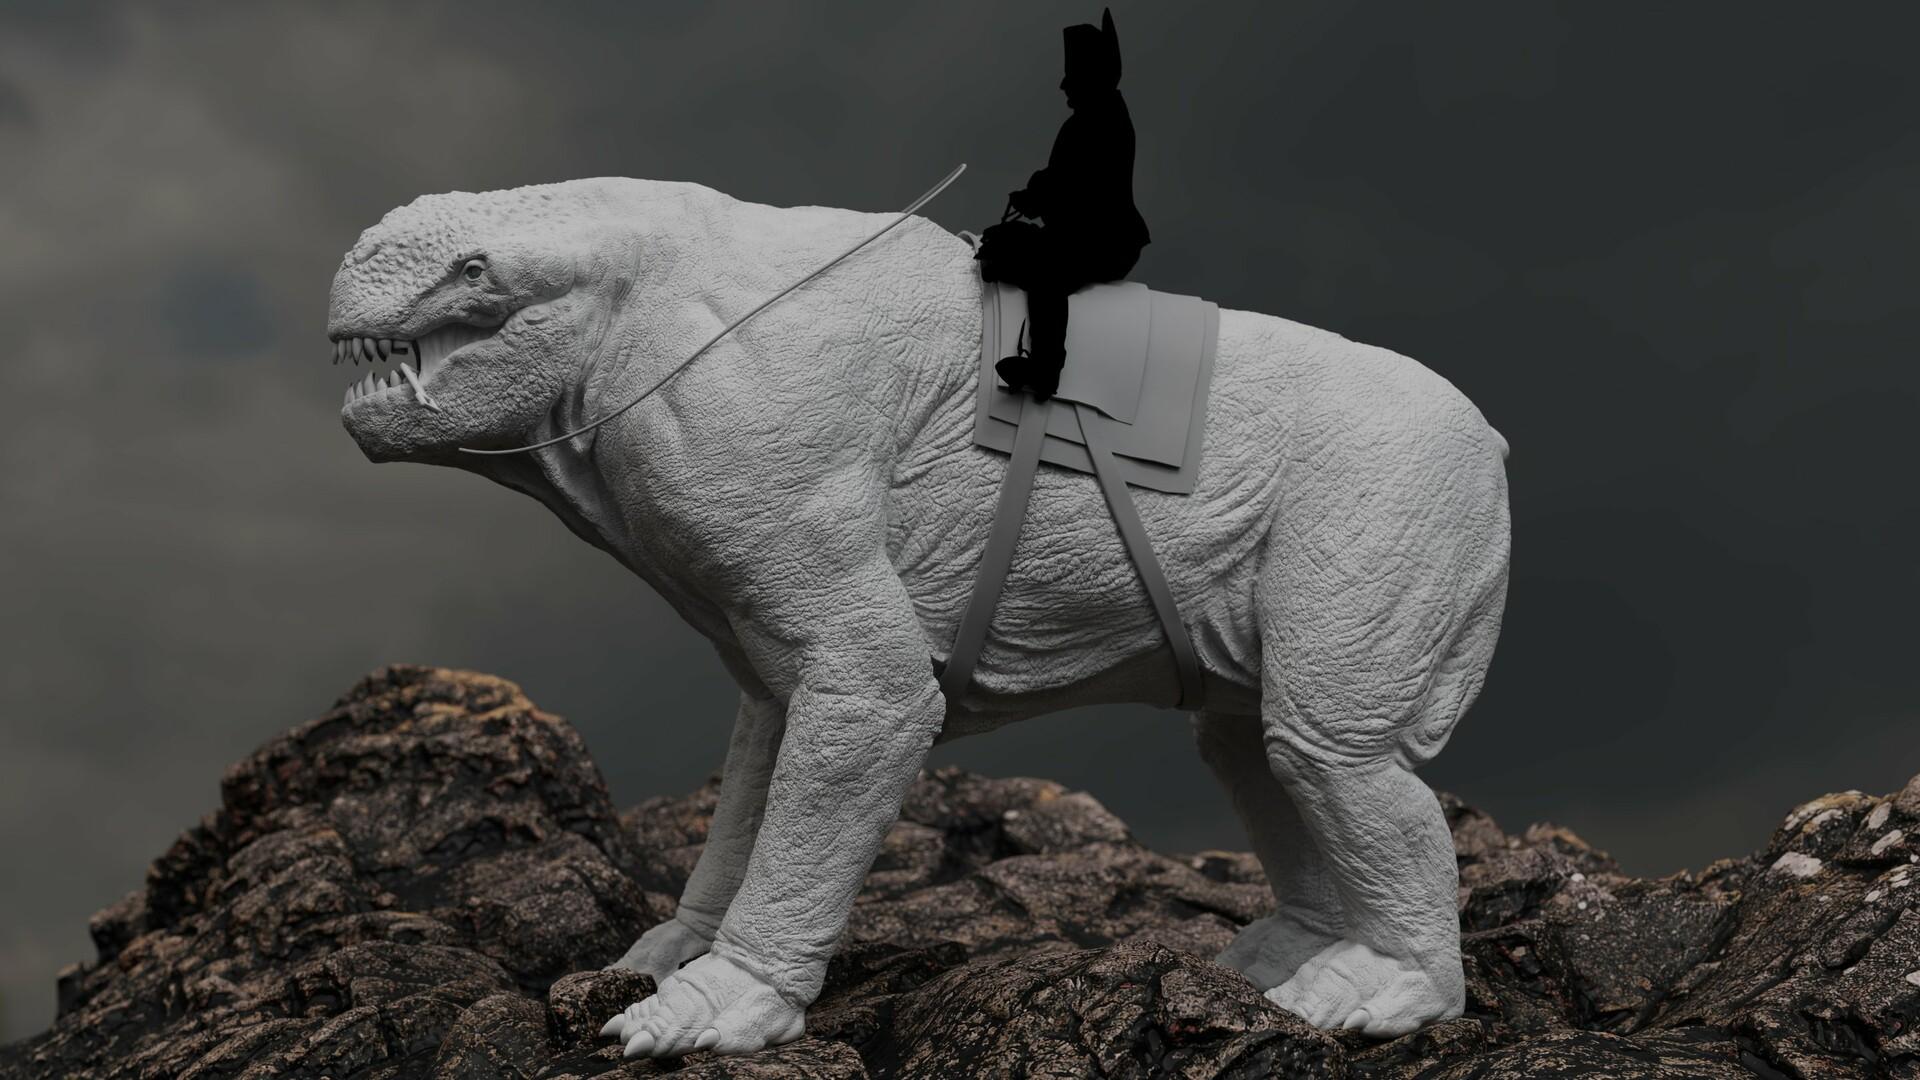 Francois rimasson beast 32b